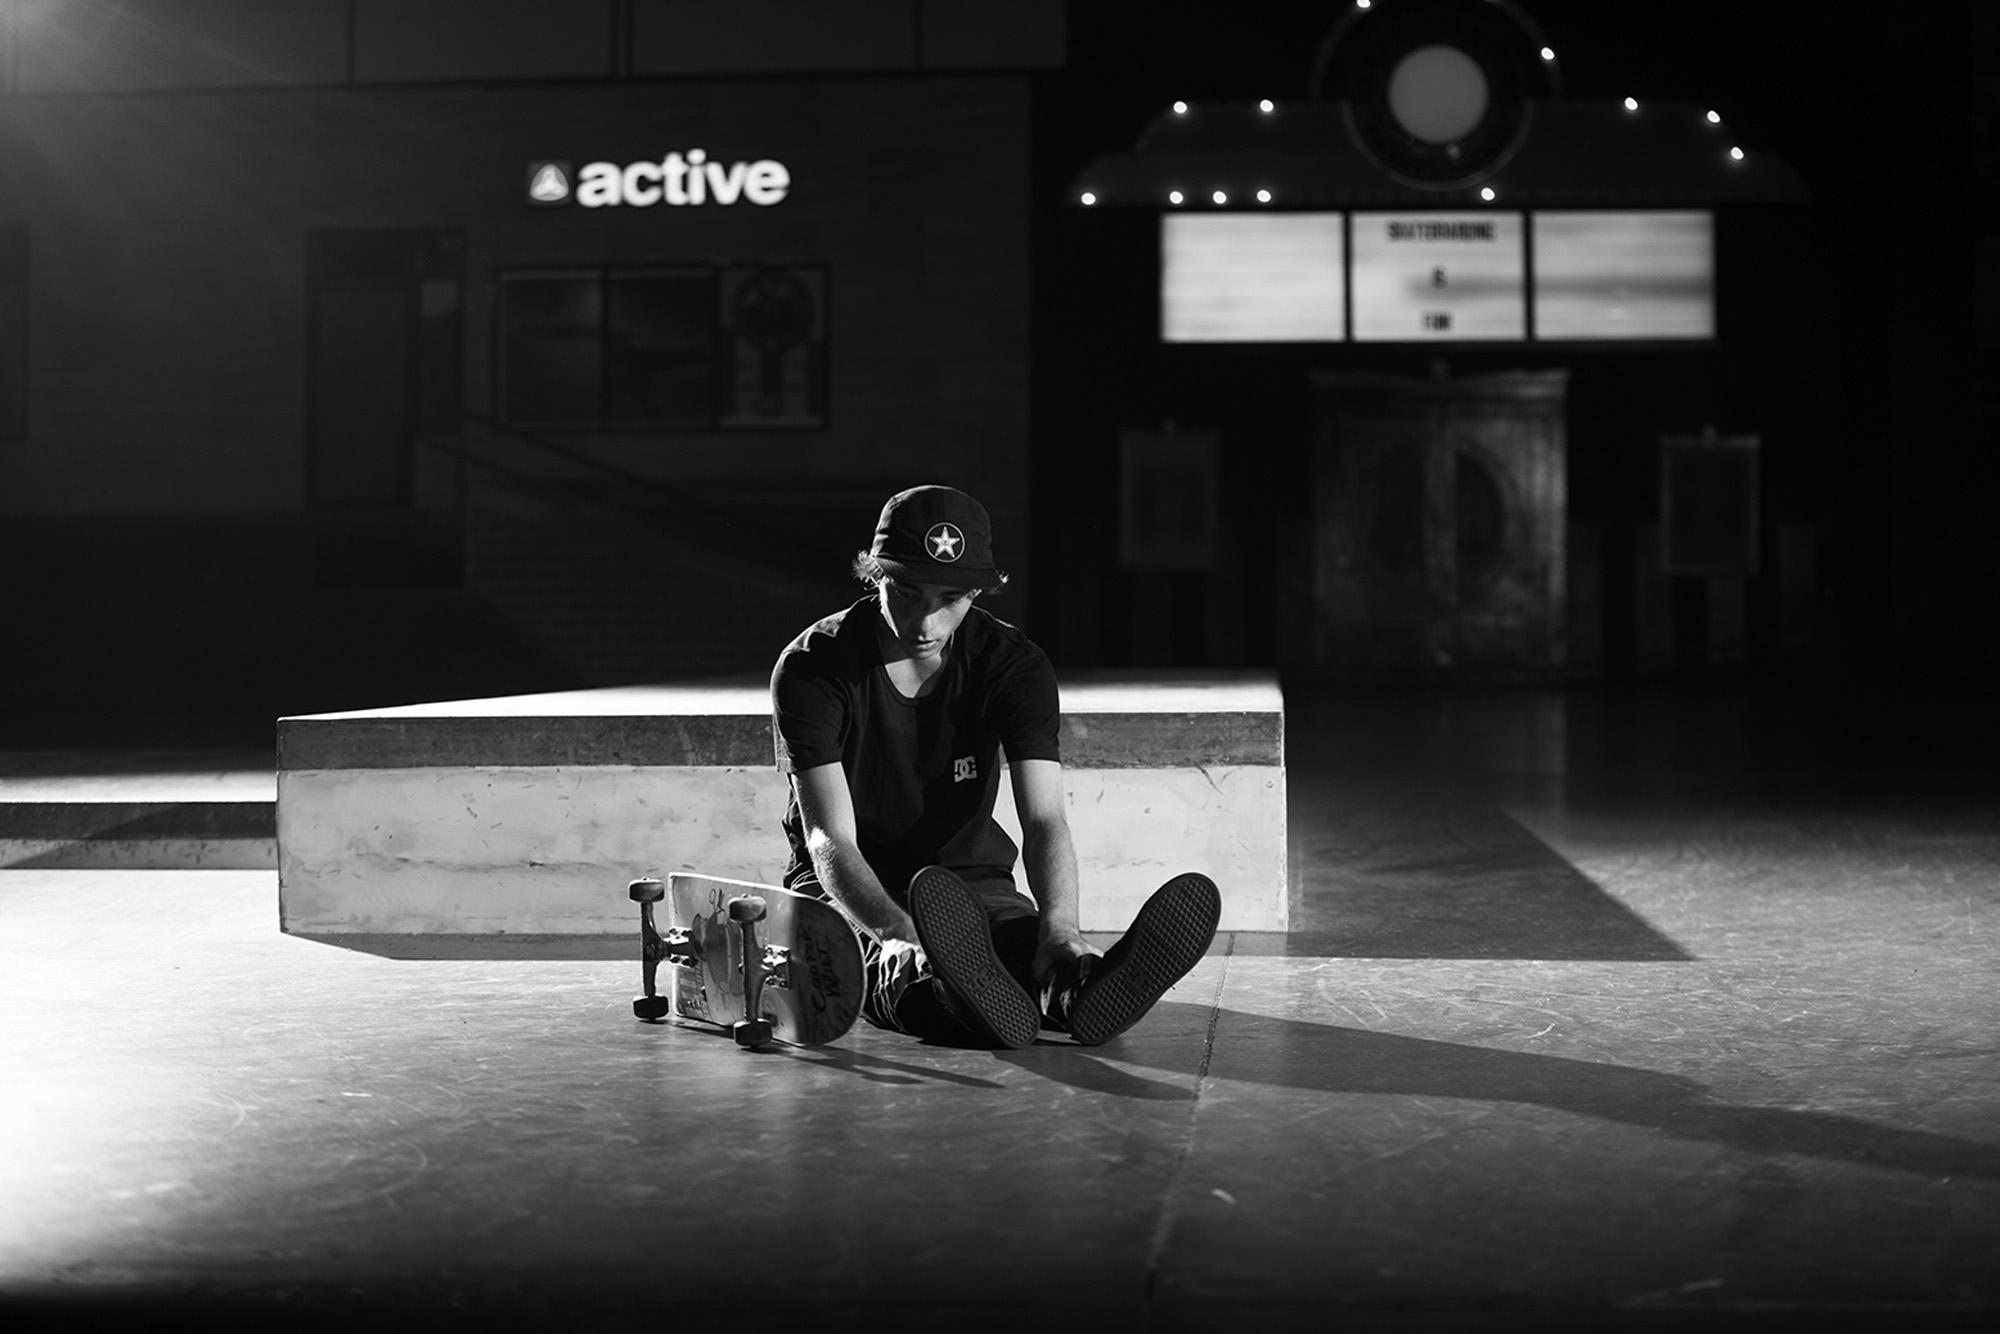 Tyson Bowerbank Almost Skateboards - The Berrics Recruit 4